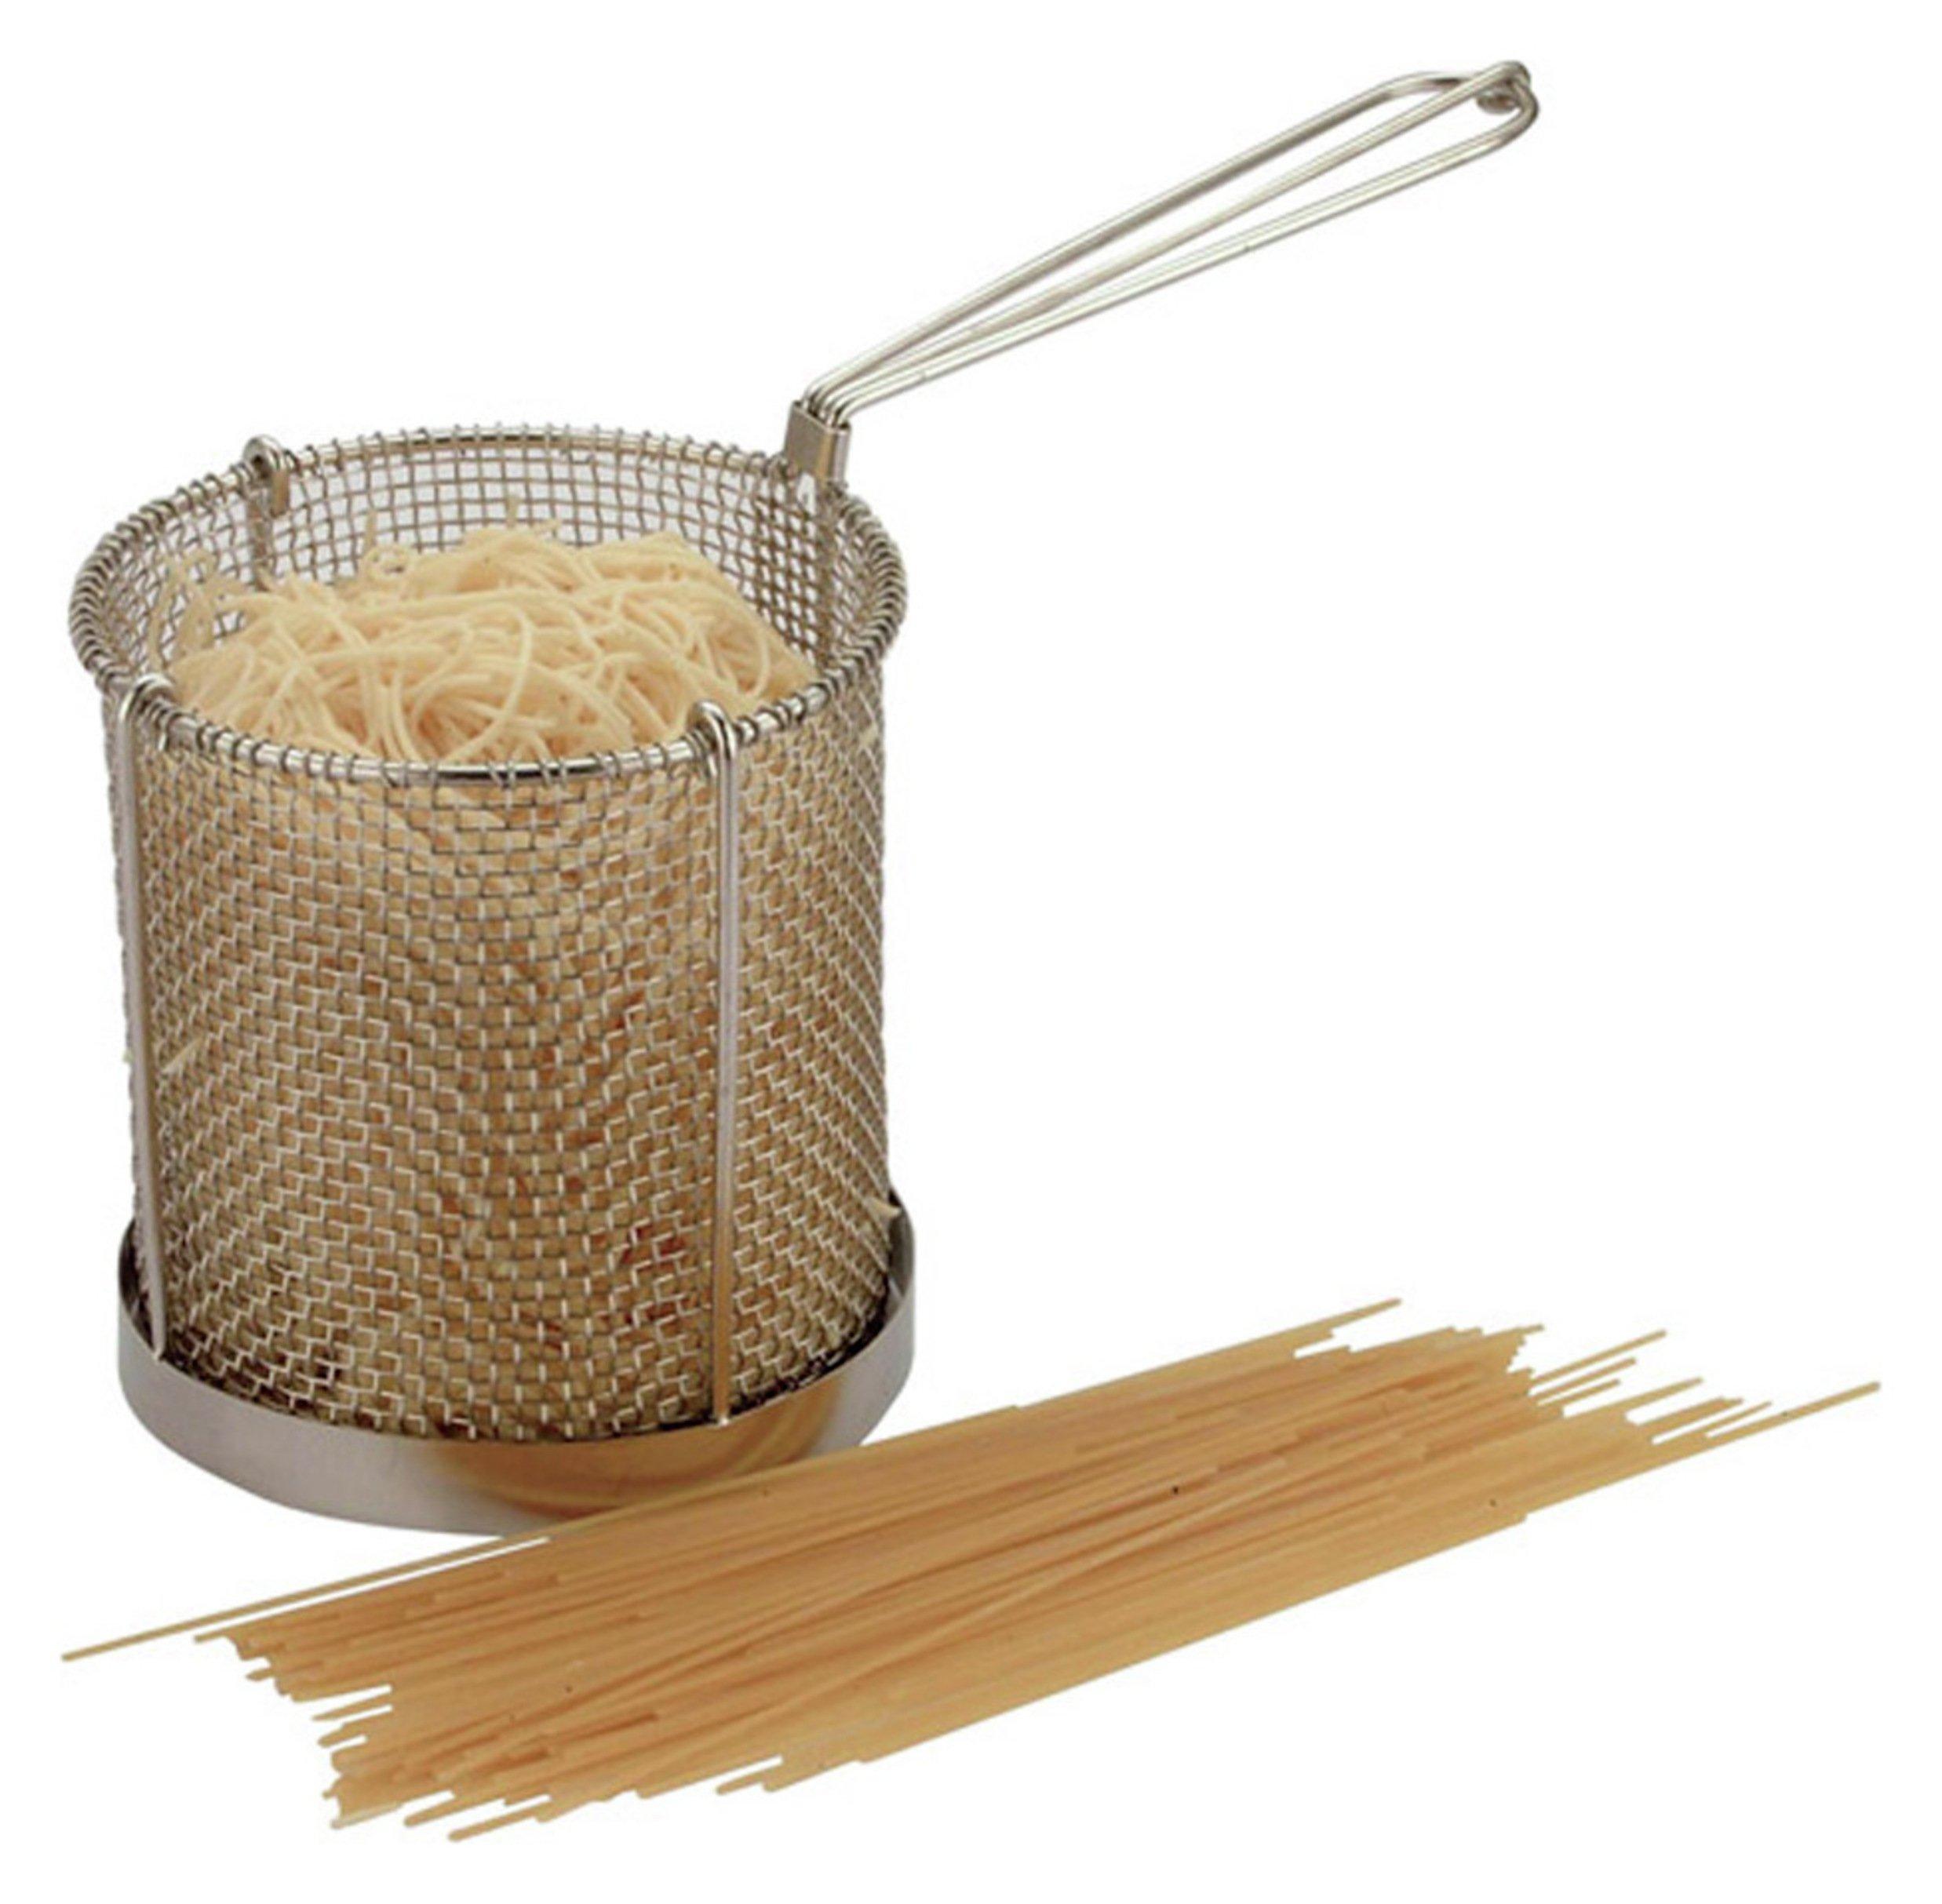 Zodiac Spaghetti Basket - Stainless Steel